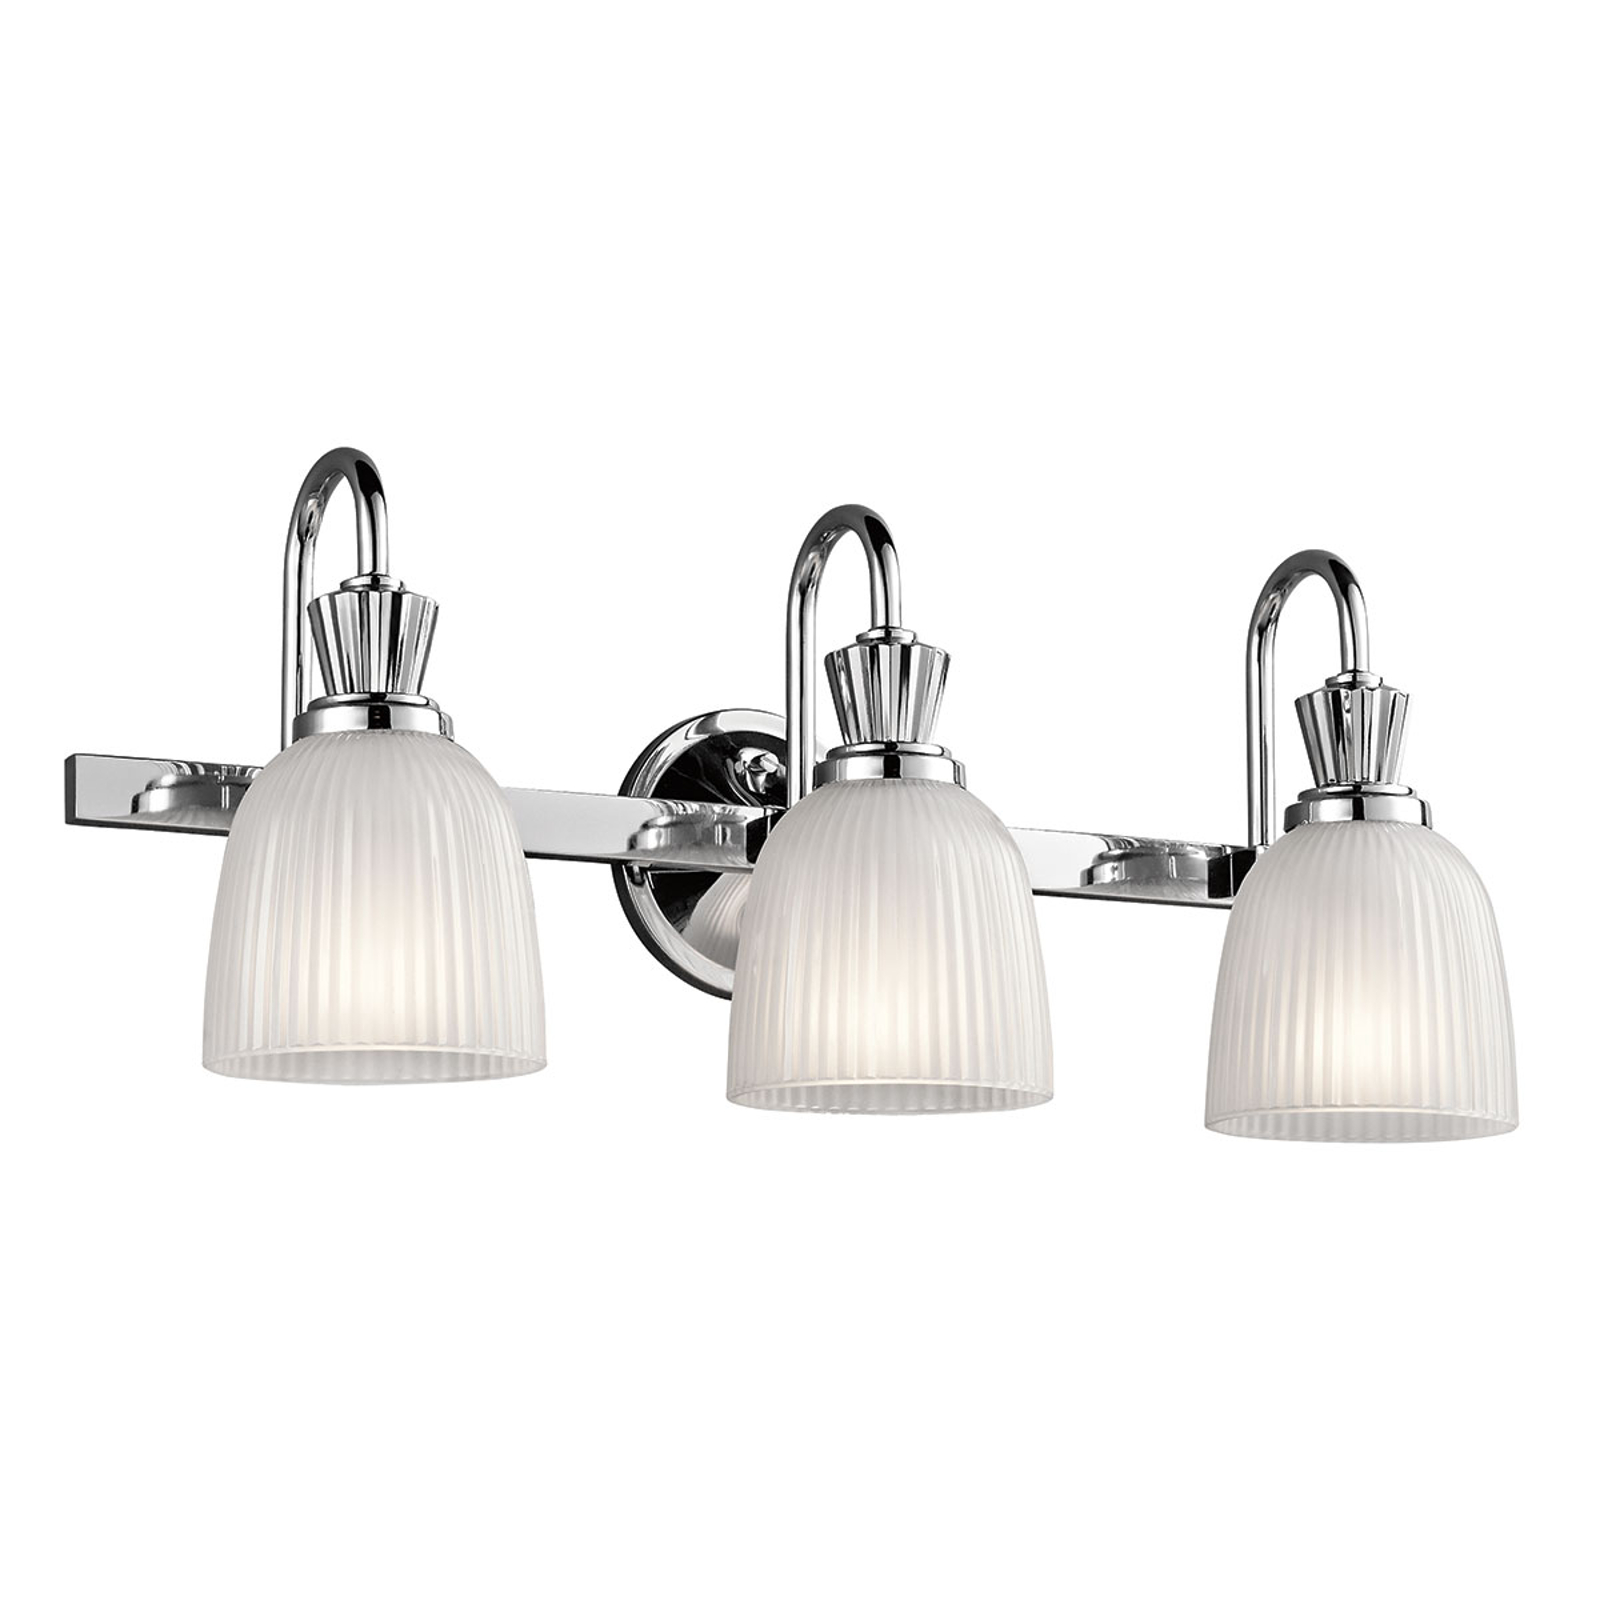 Applique salle de bain LED Cora au design brillant